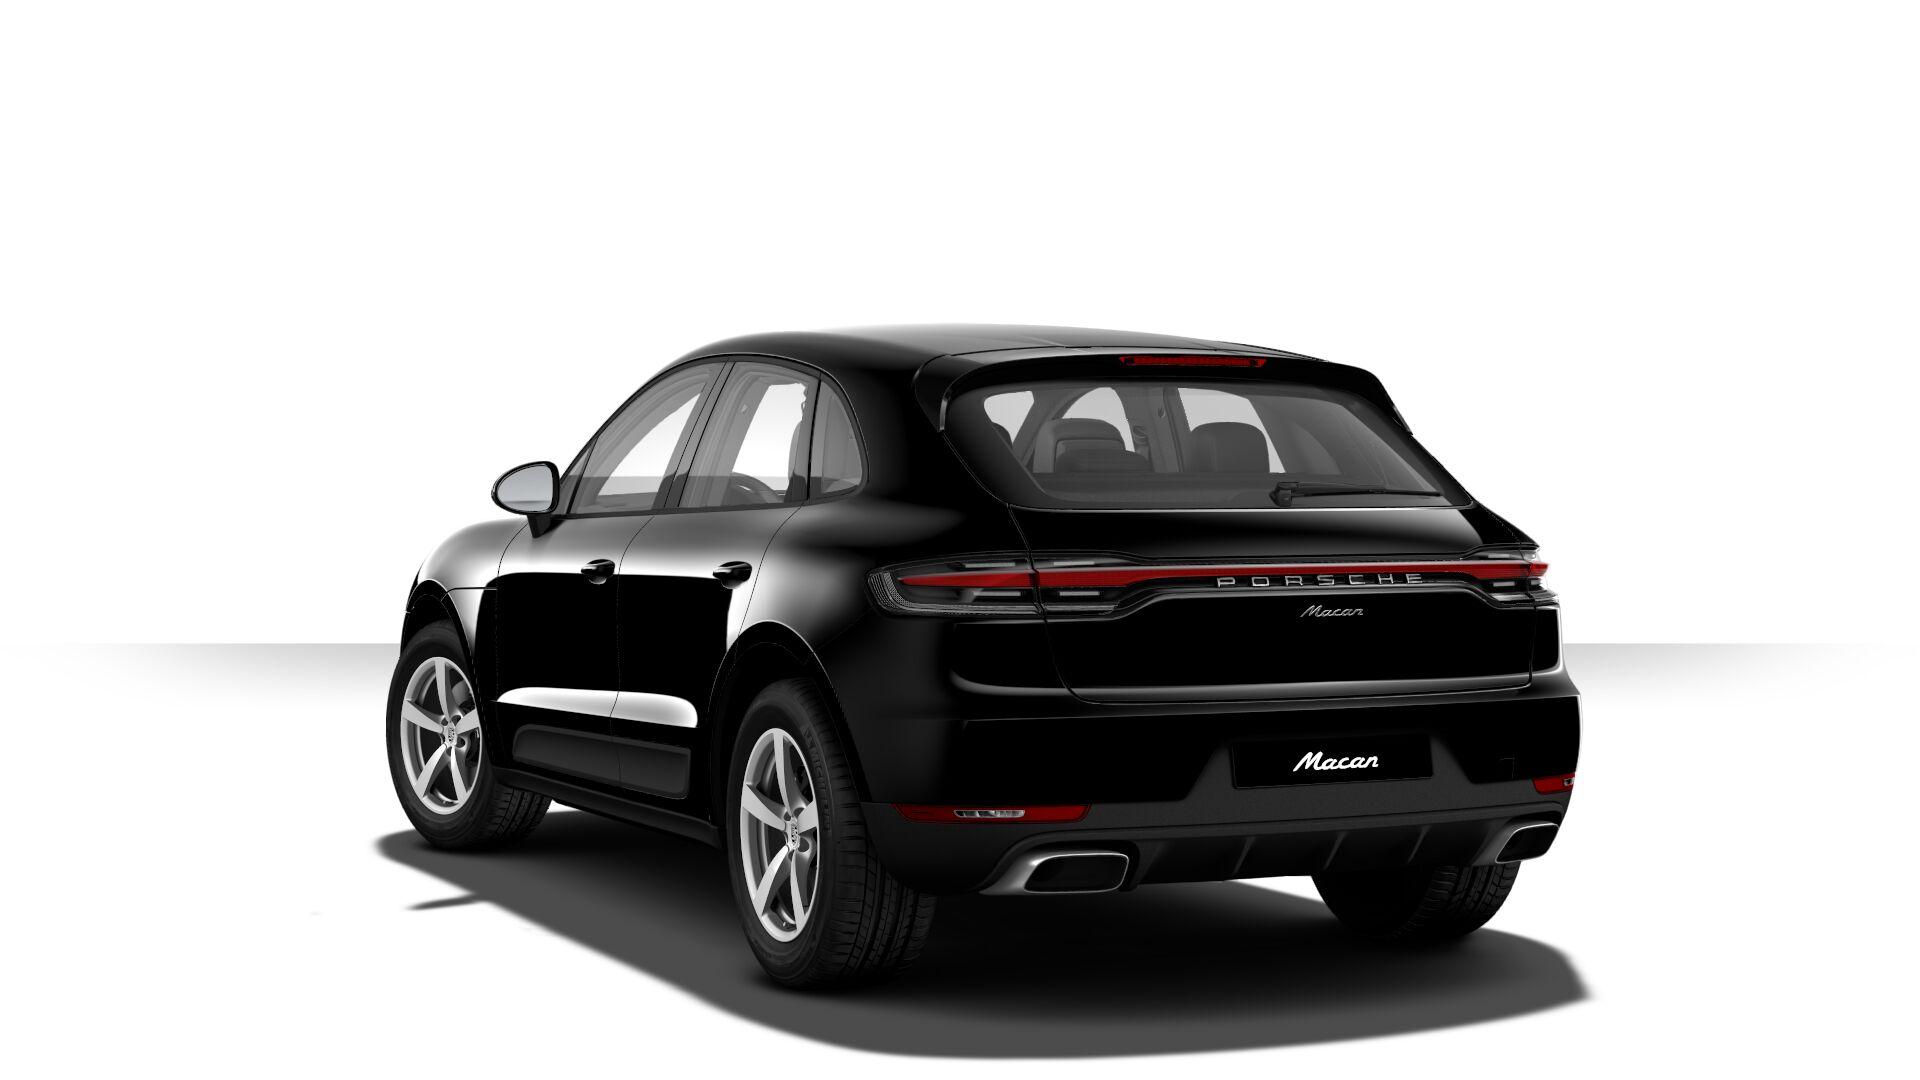 Porsche-Macan-czarny-1